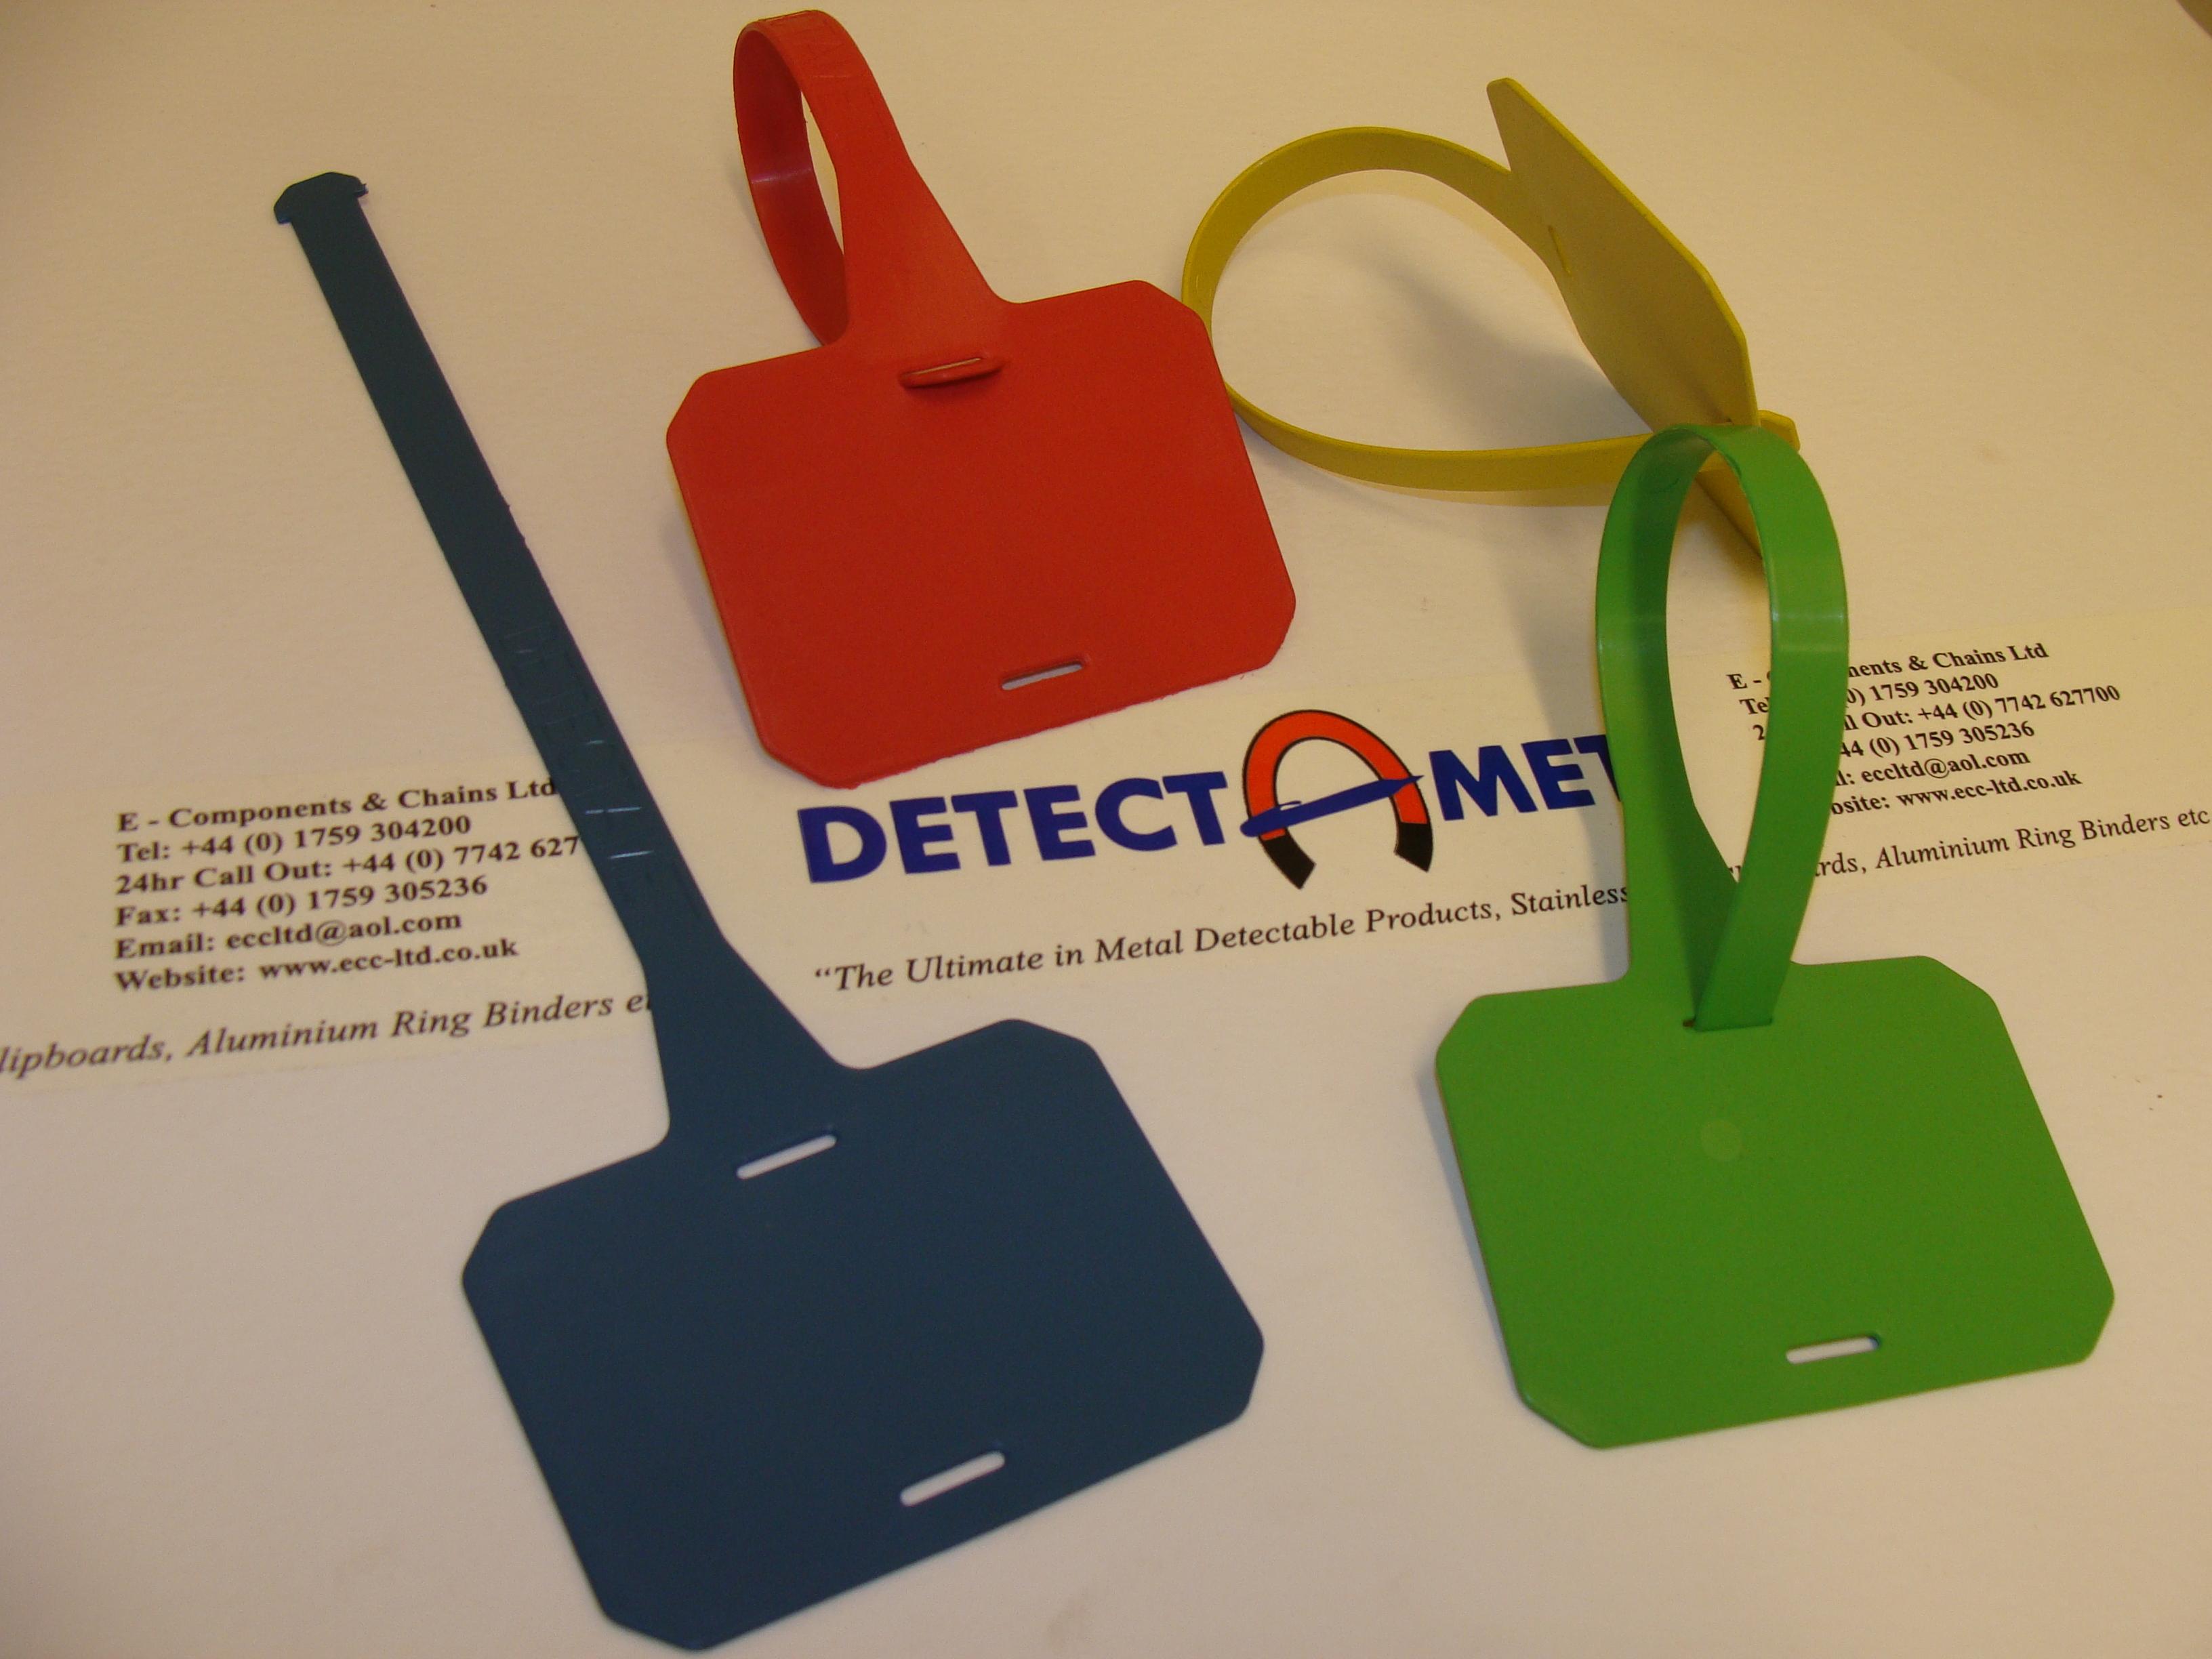 This Tag: Read **New** Metal Detectable Plastic Luggage Tag